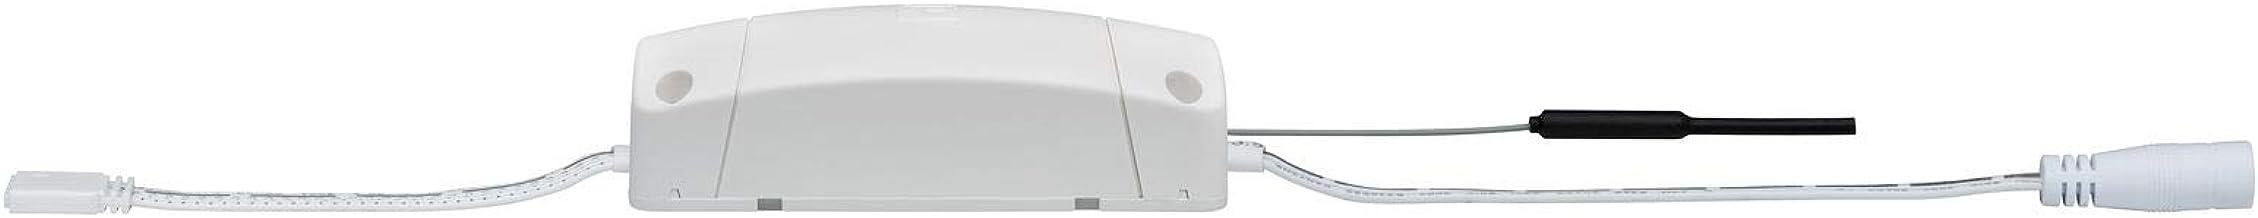 Paulmann 50046 Smarthome Zigbee Maxled Tunable White Controller max. 144W 24V DC-schakelapparaat 50046 - Amazon Echo Plus-...